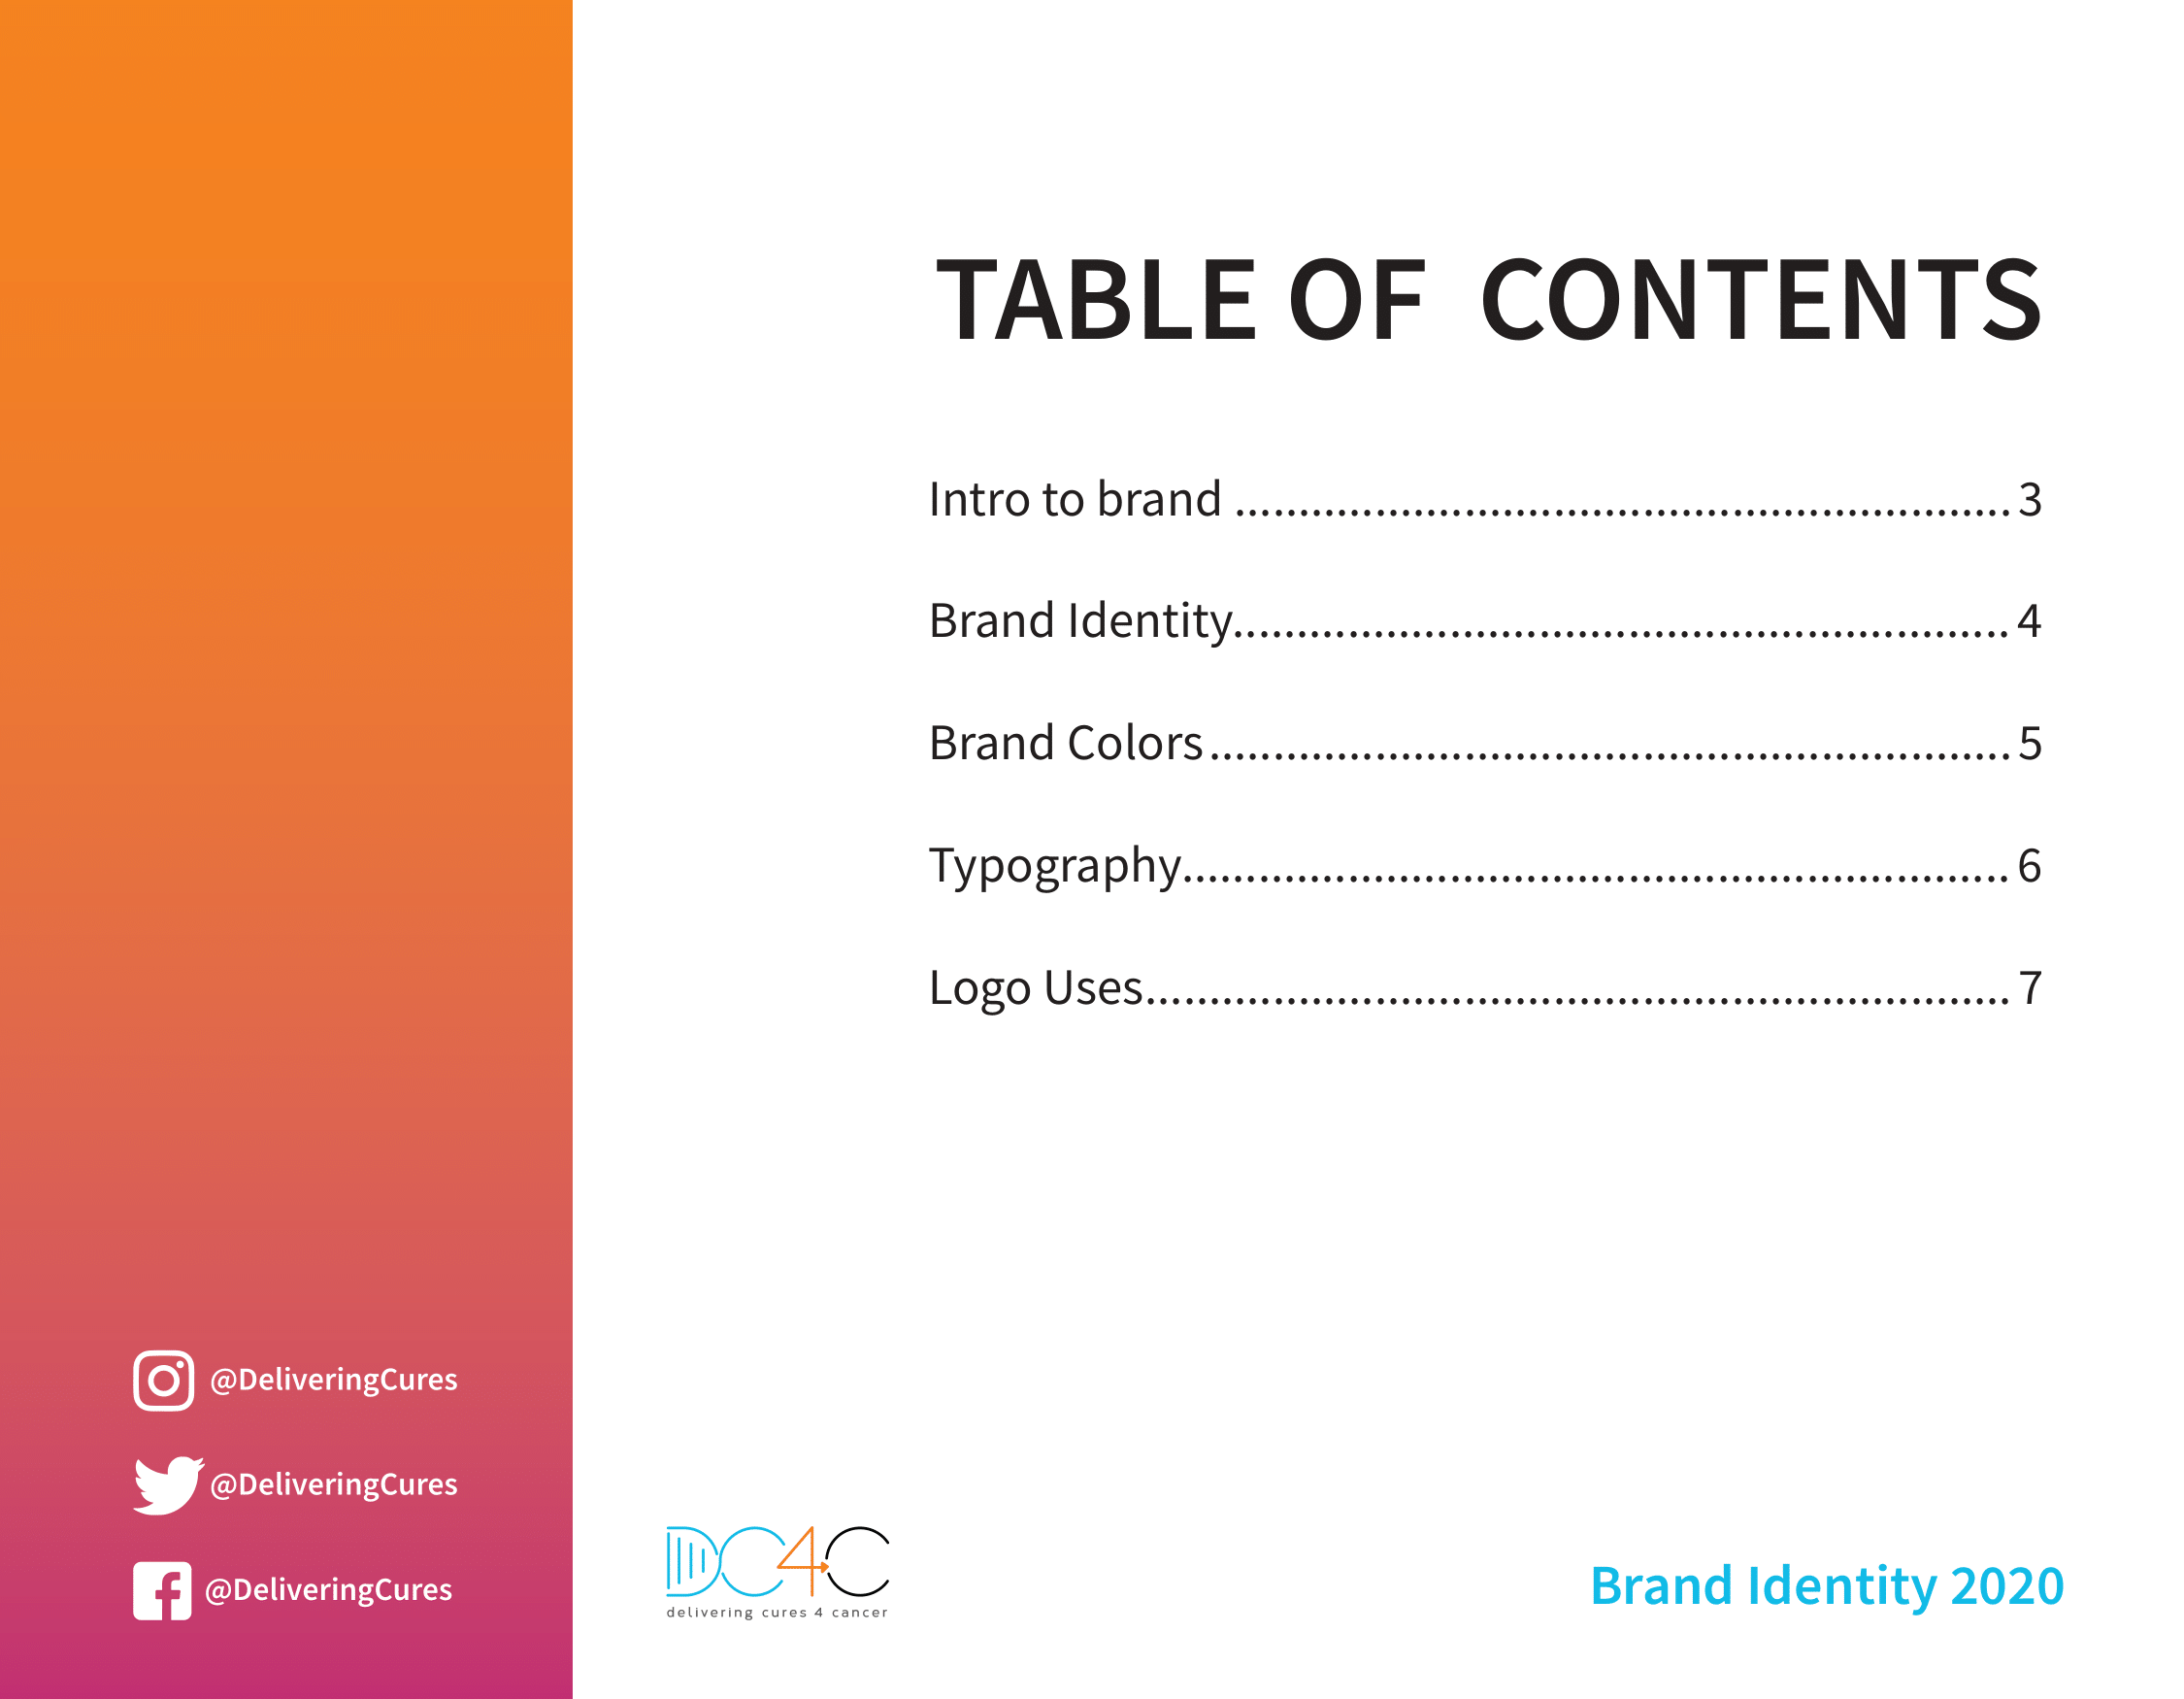 DC4C-Brand_Identity-2020-2